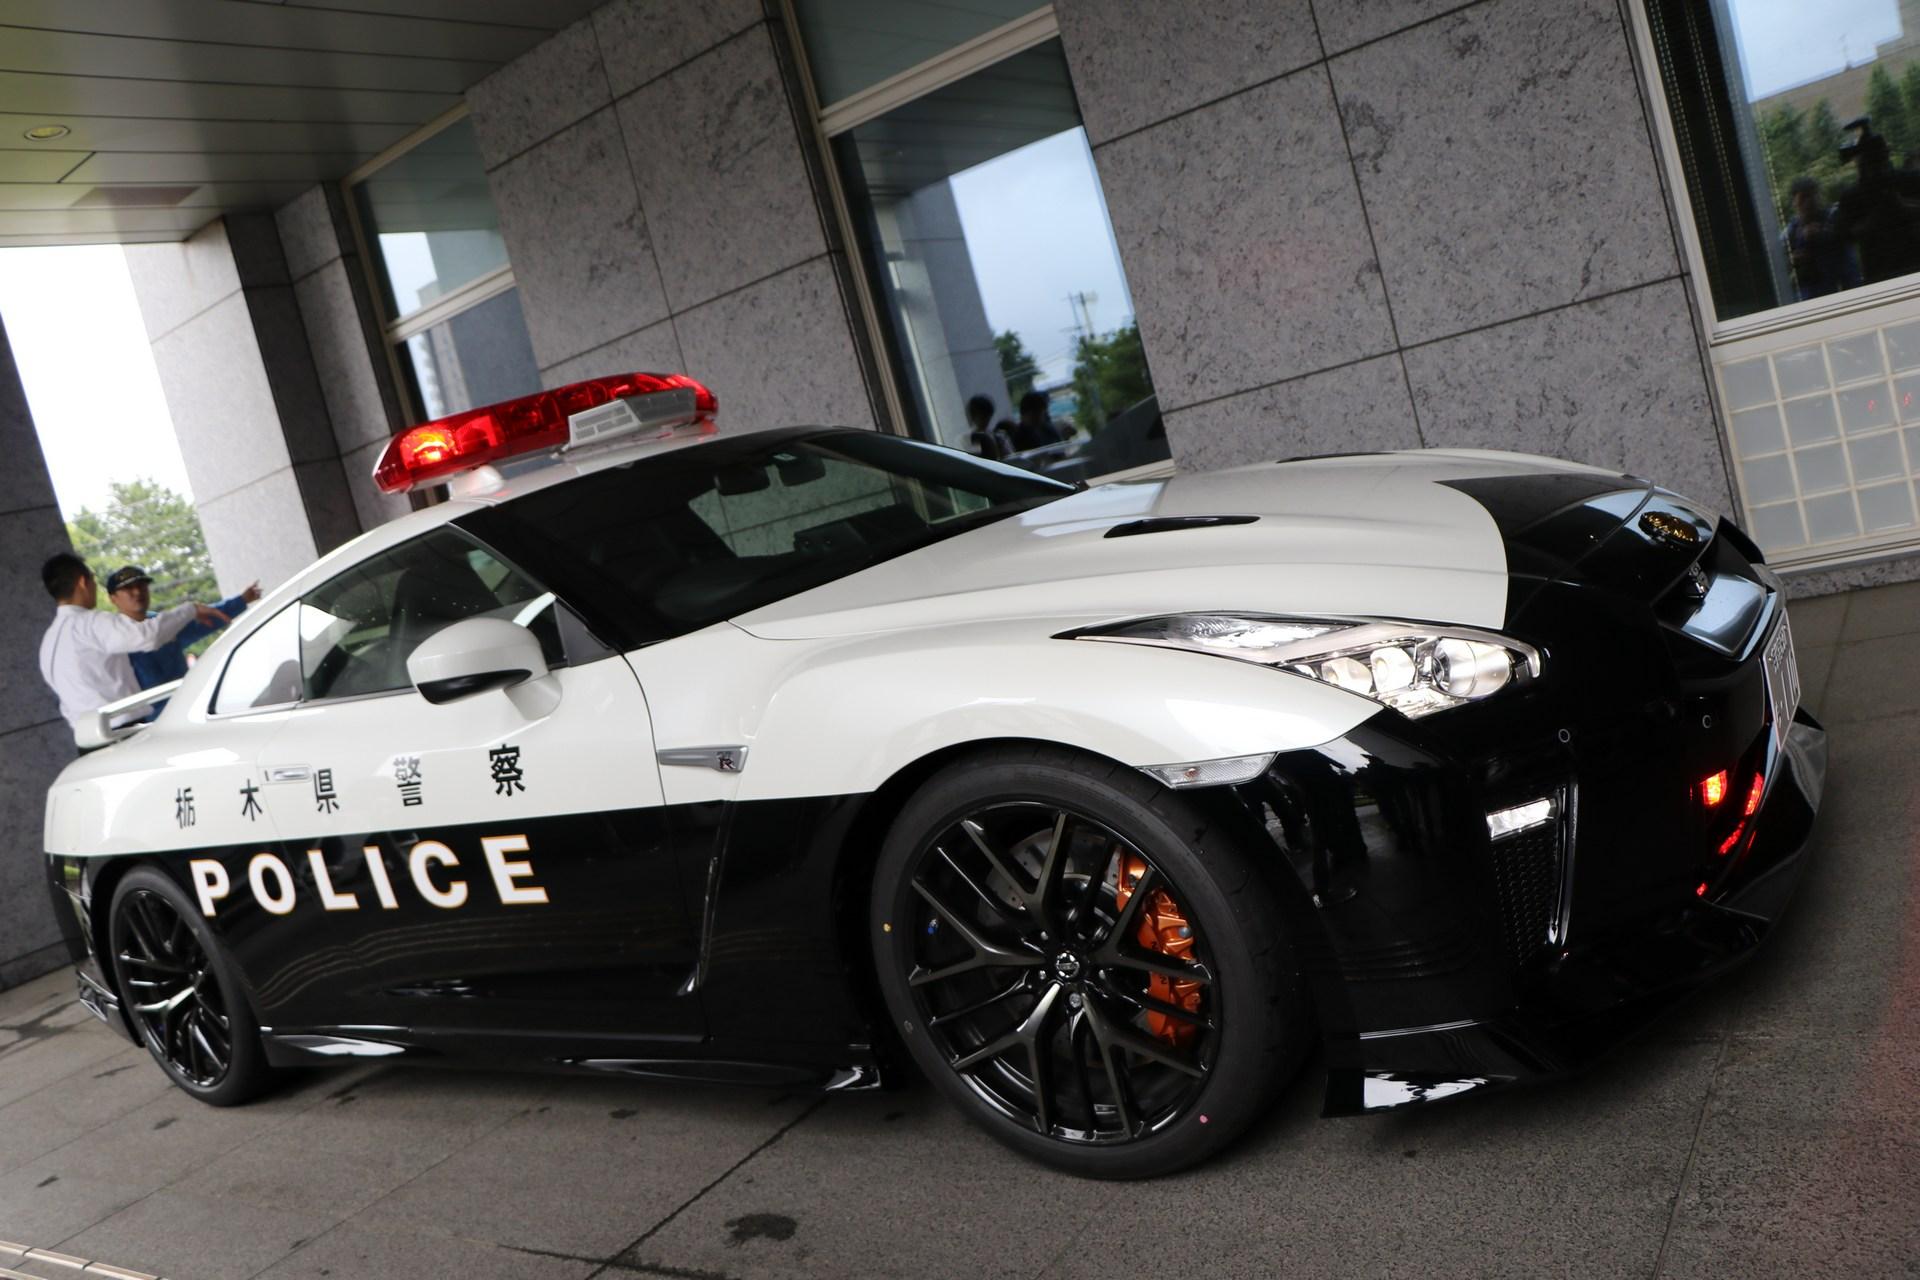 Nissan_GT-R_Police_Car_0005